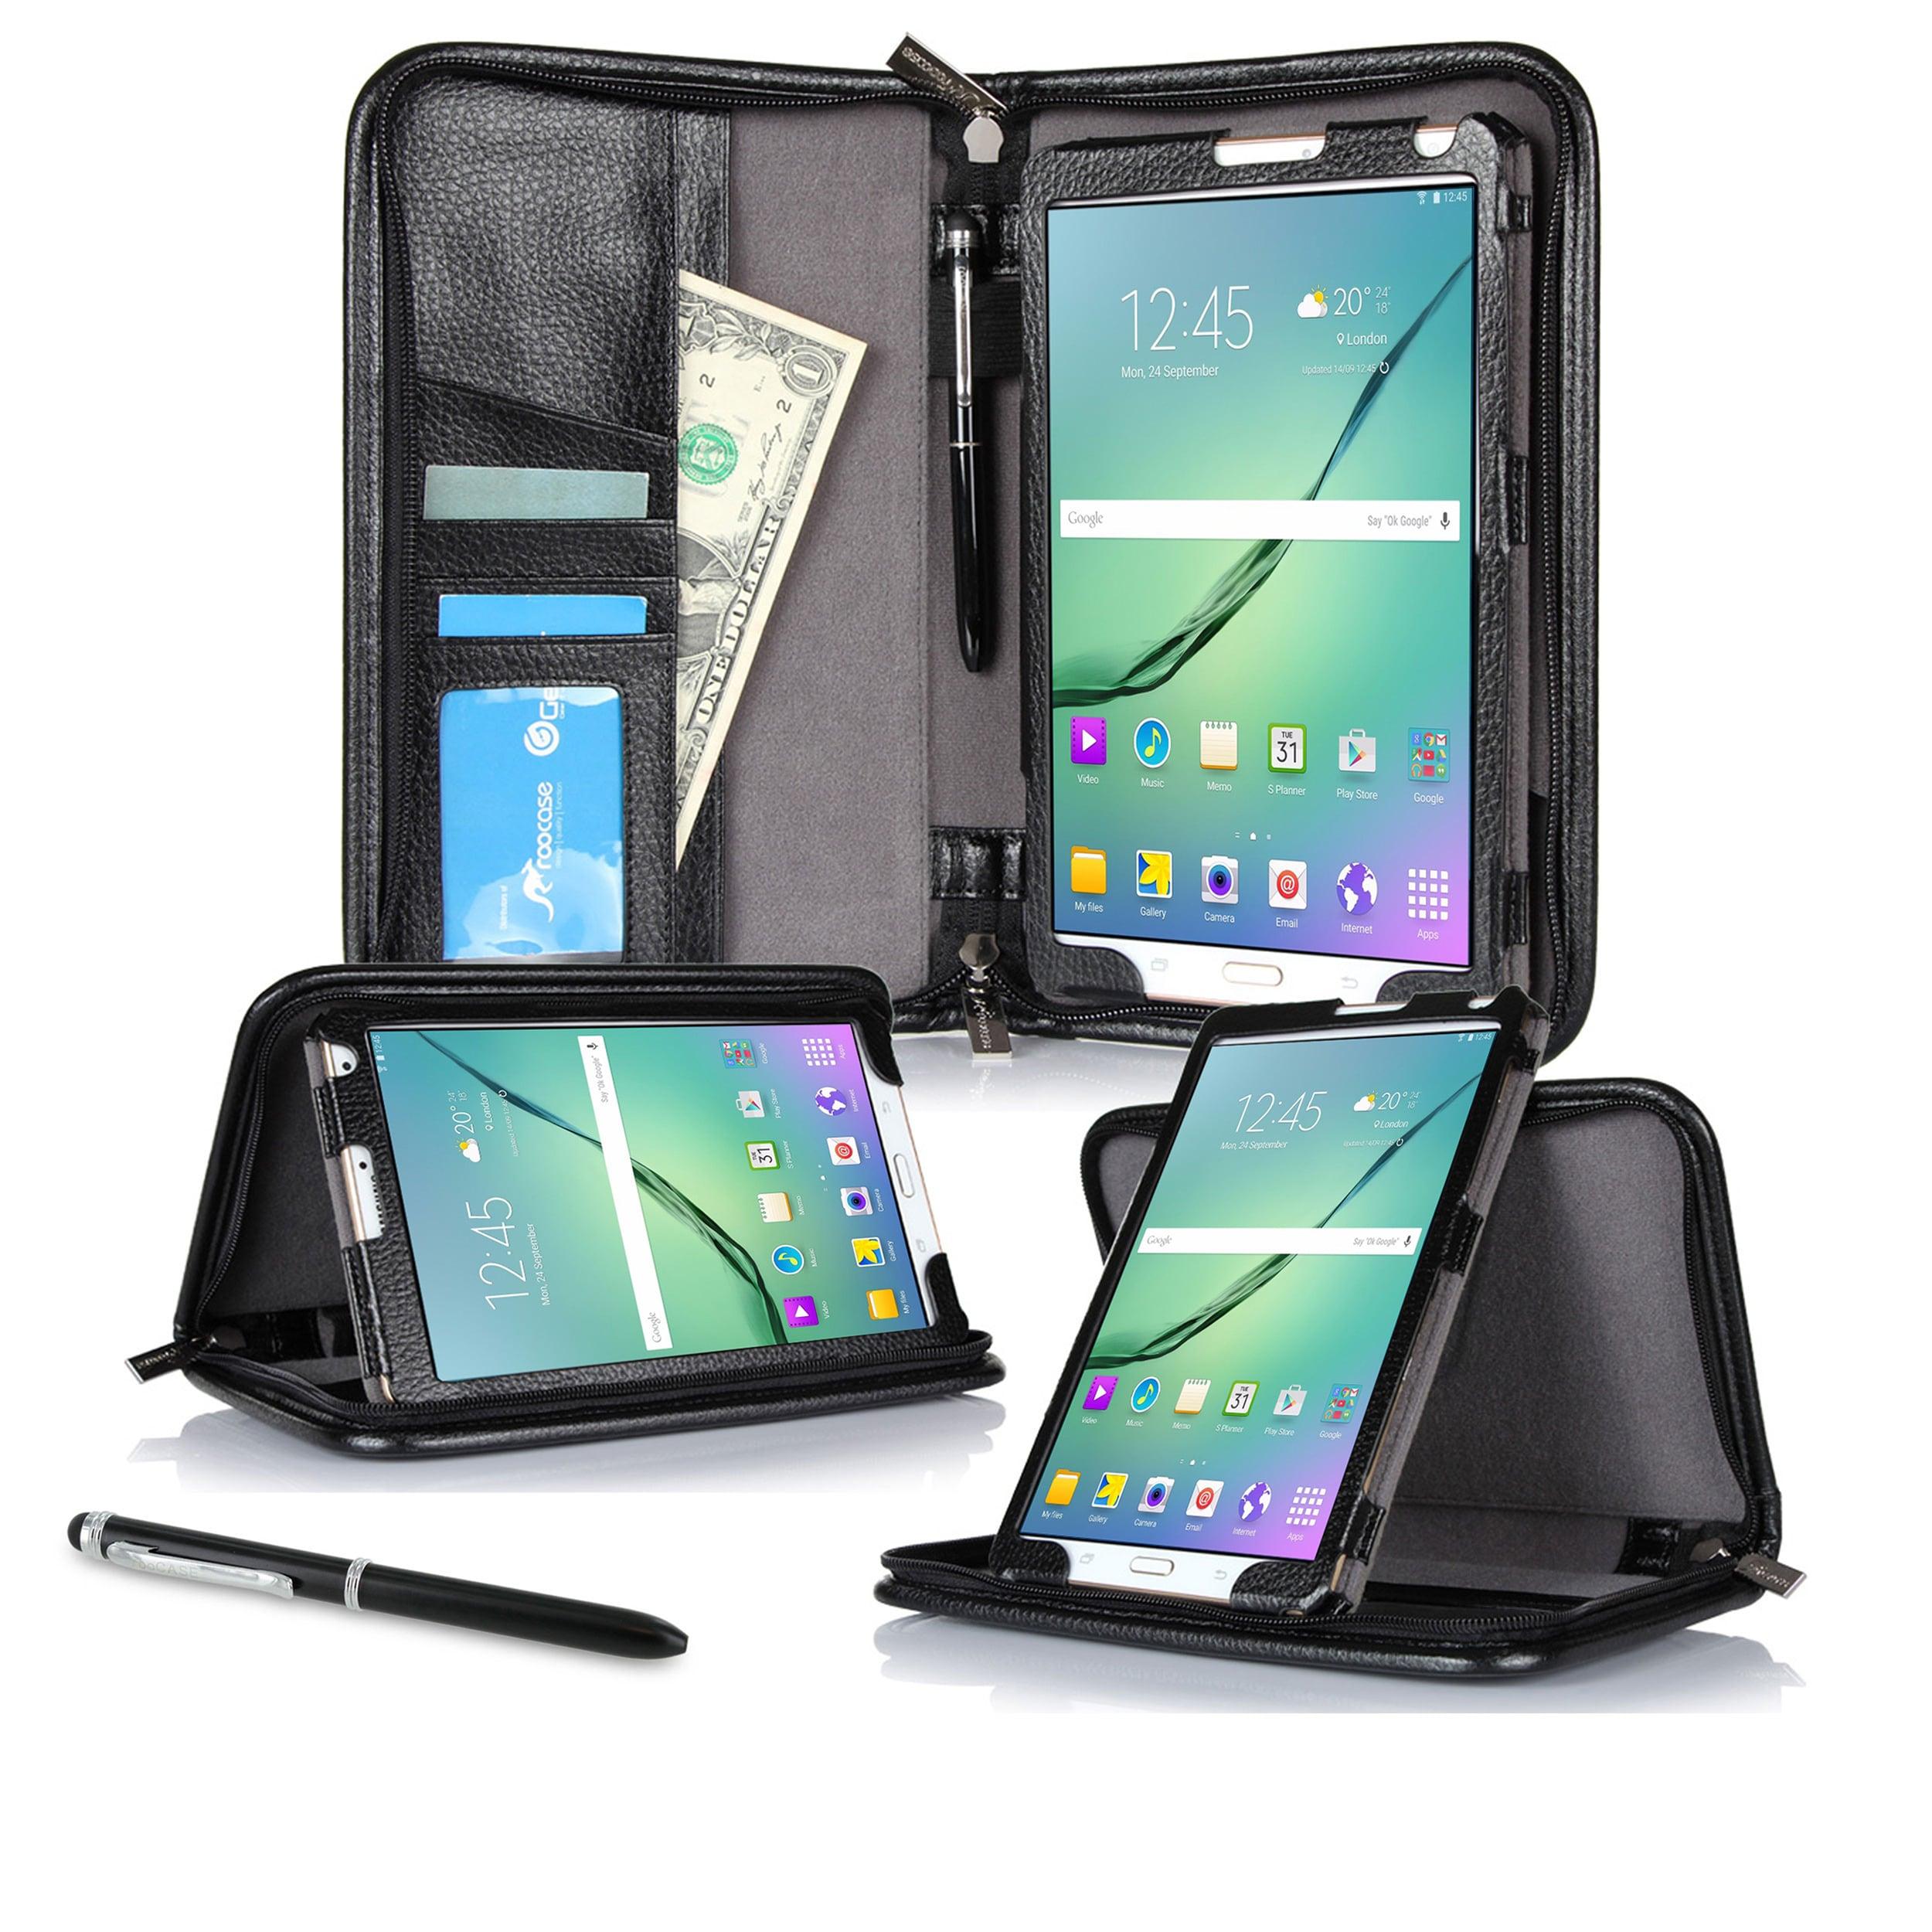 roocase Executive Case for Samsung Galaxy Tab S2 9.7